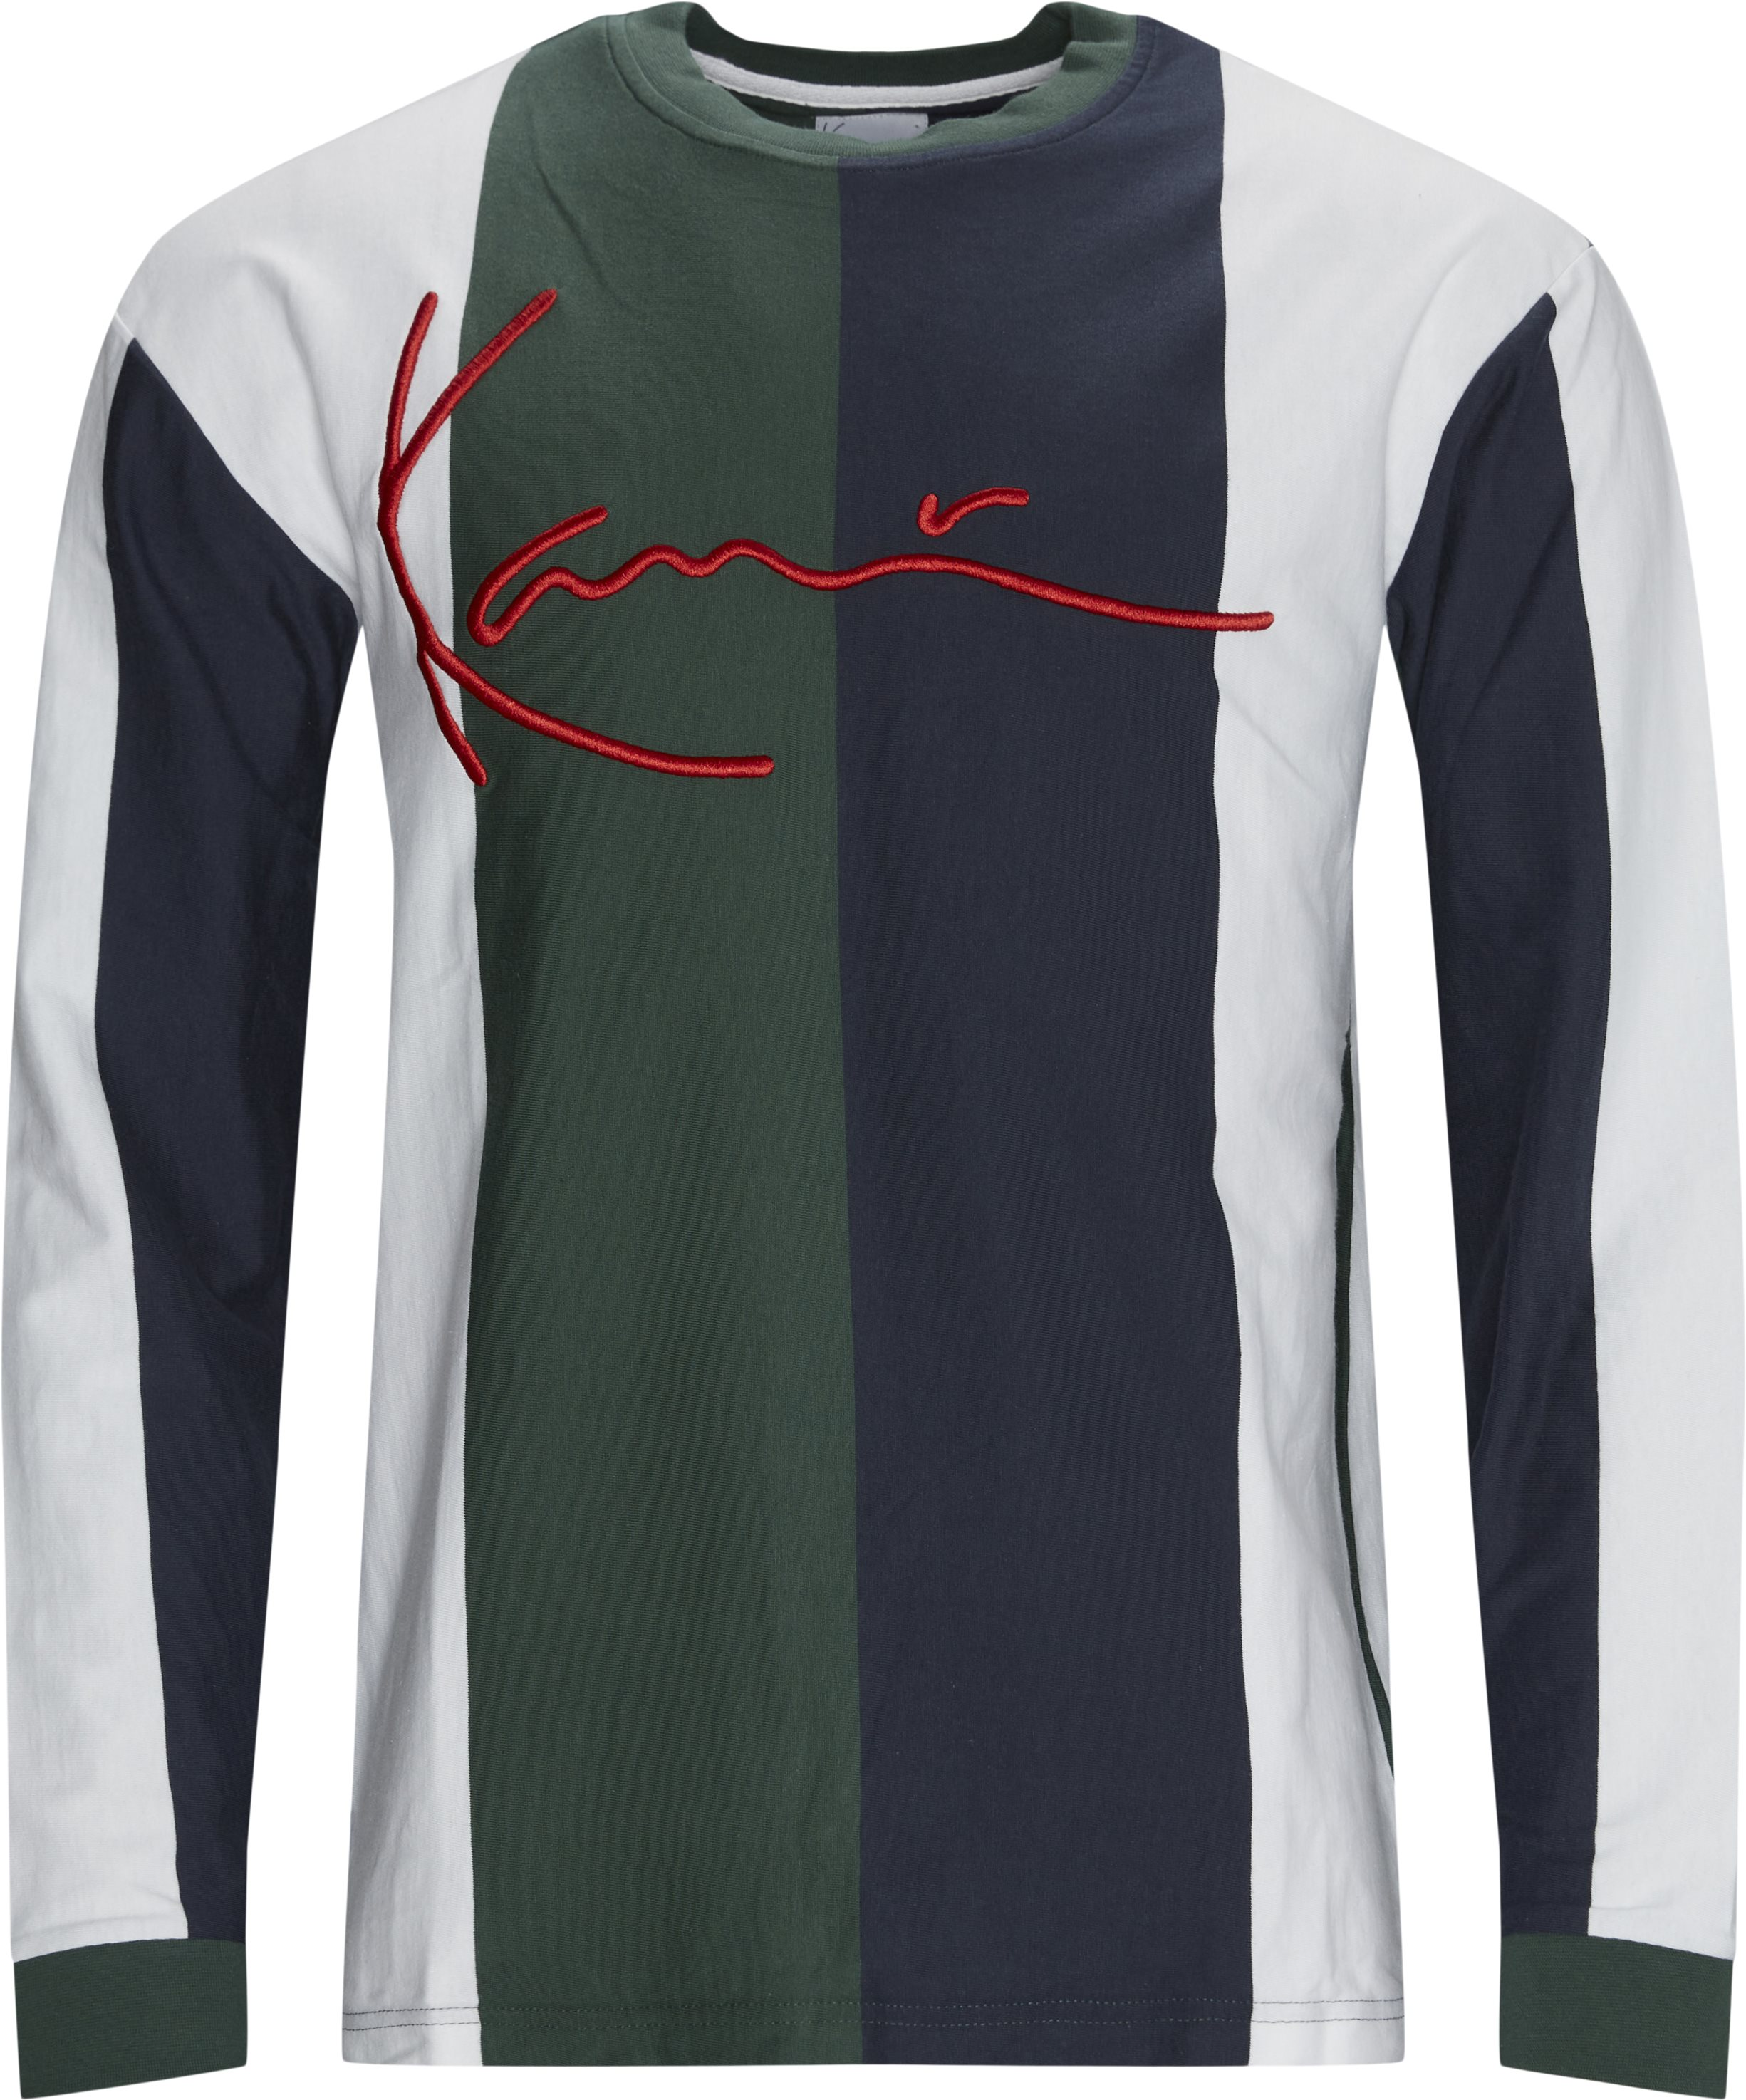 SIGNATURE STRIPE Langærmet - T-shirts - Regular fit - Grøn